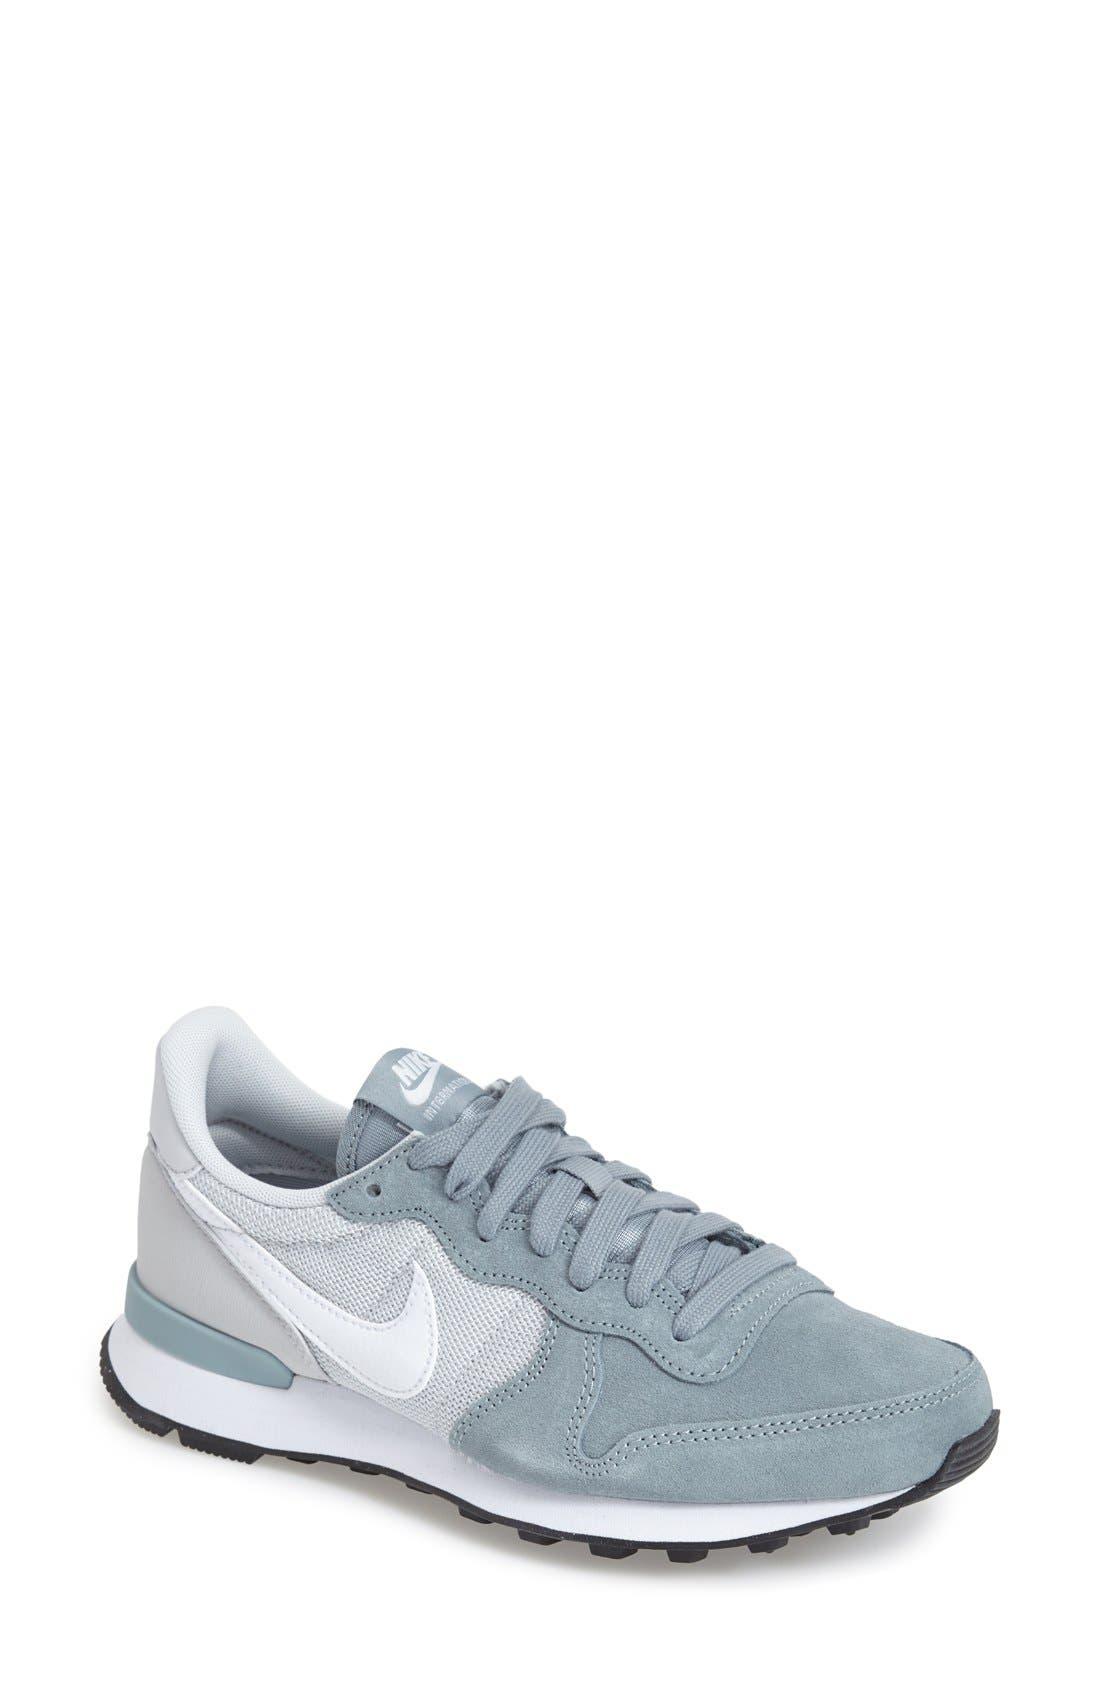 'Internationalist' Sneaker,                             Main thumbnail 1, color,                             Grey/ Platinum/ Black